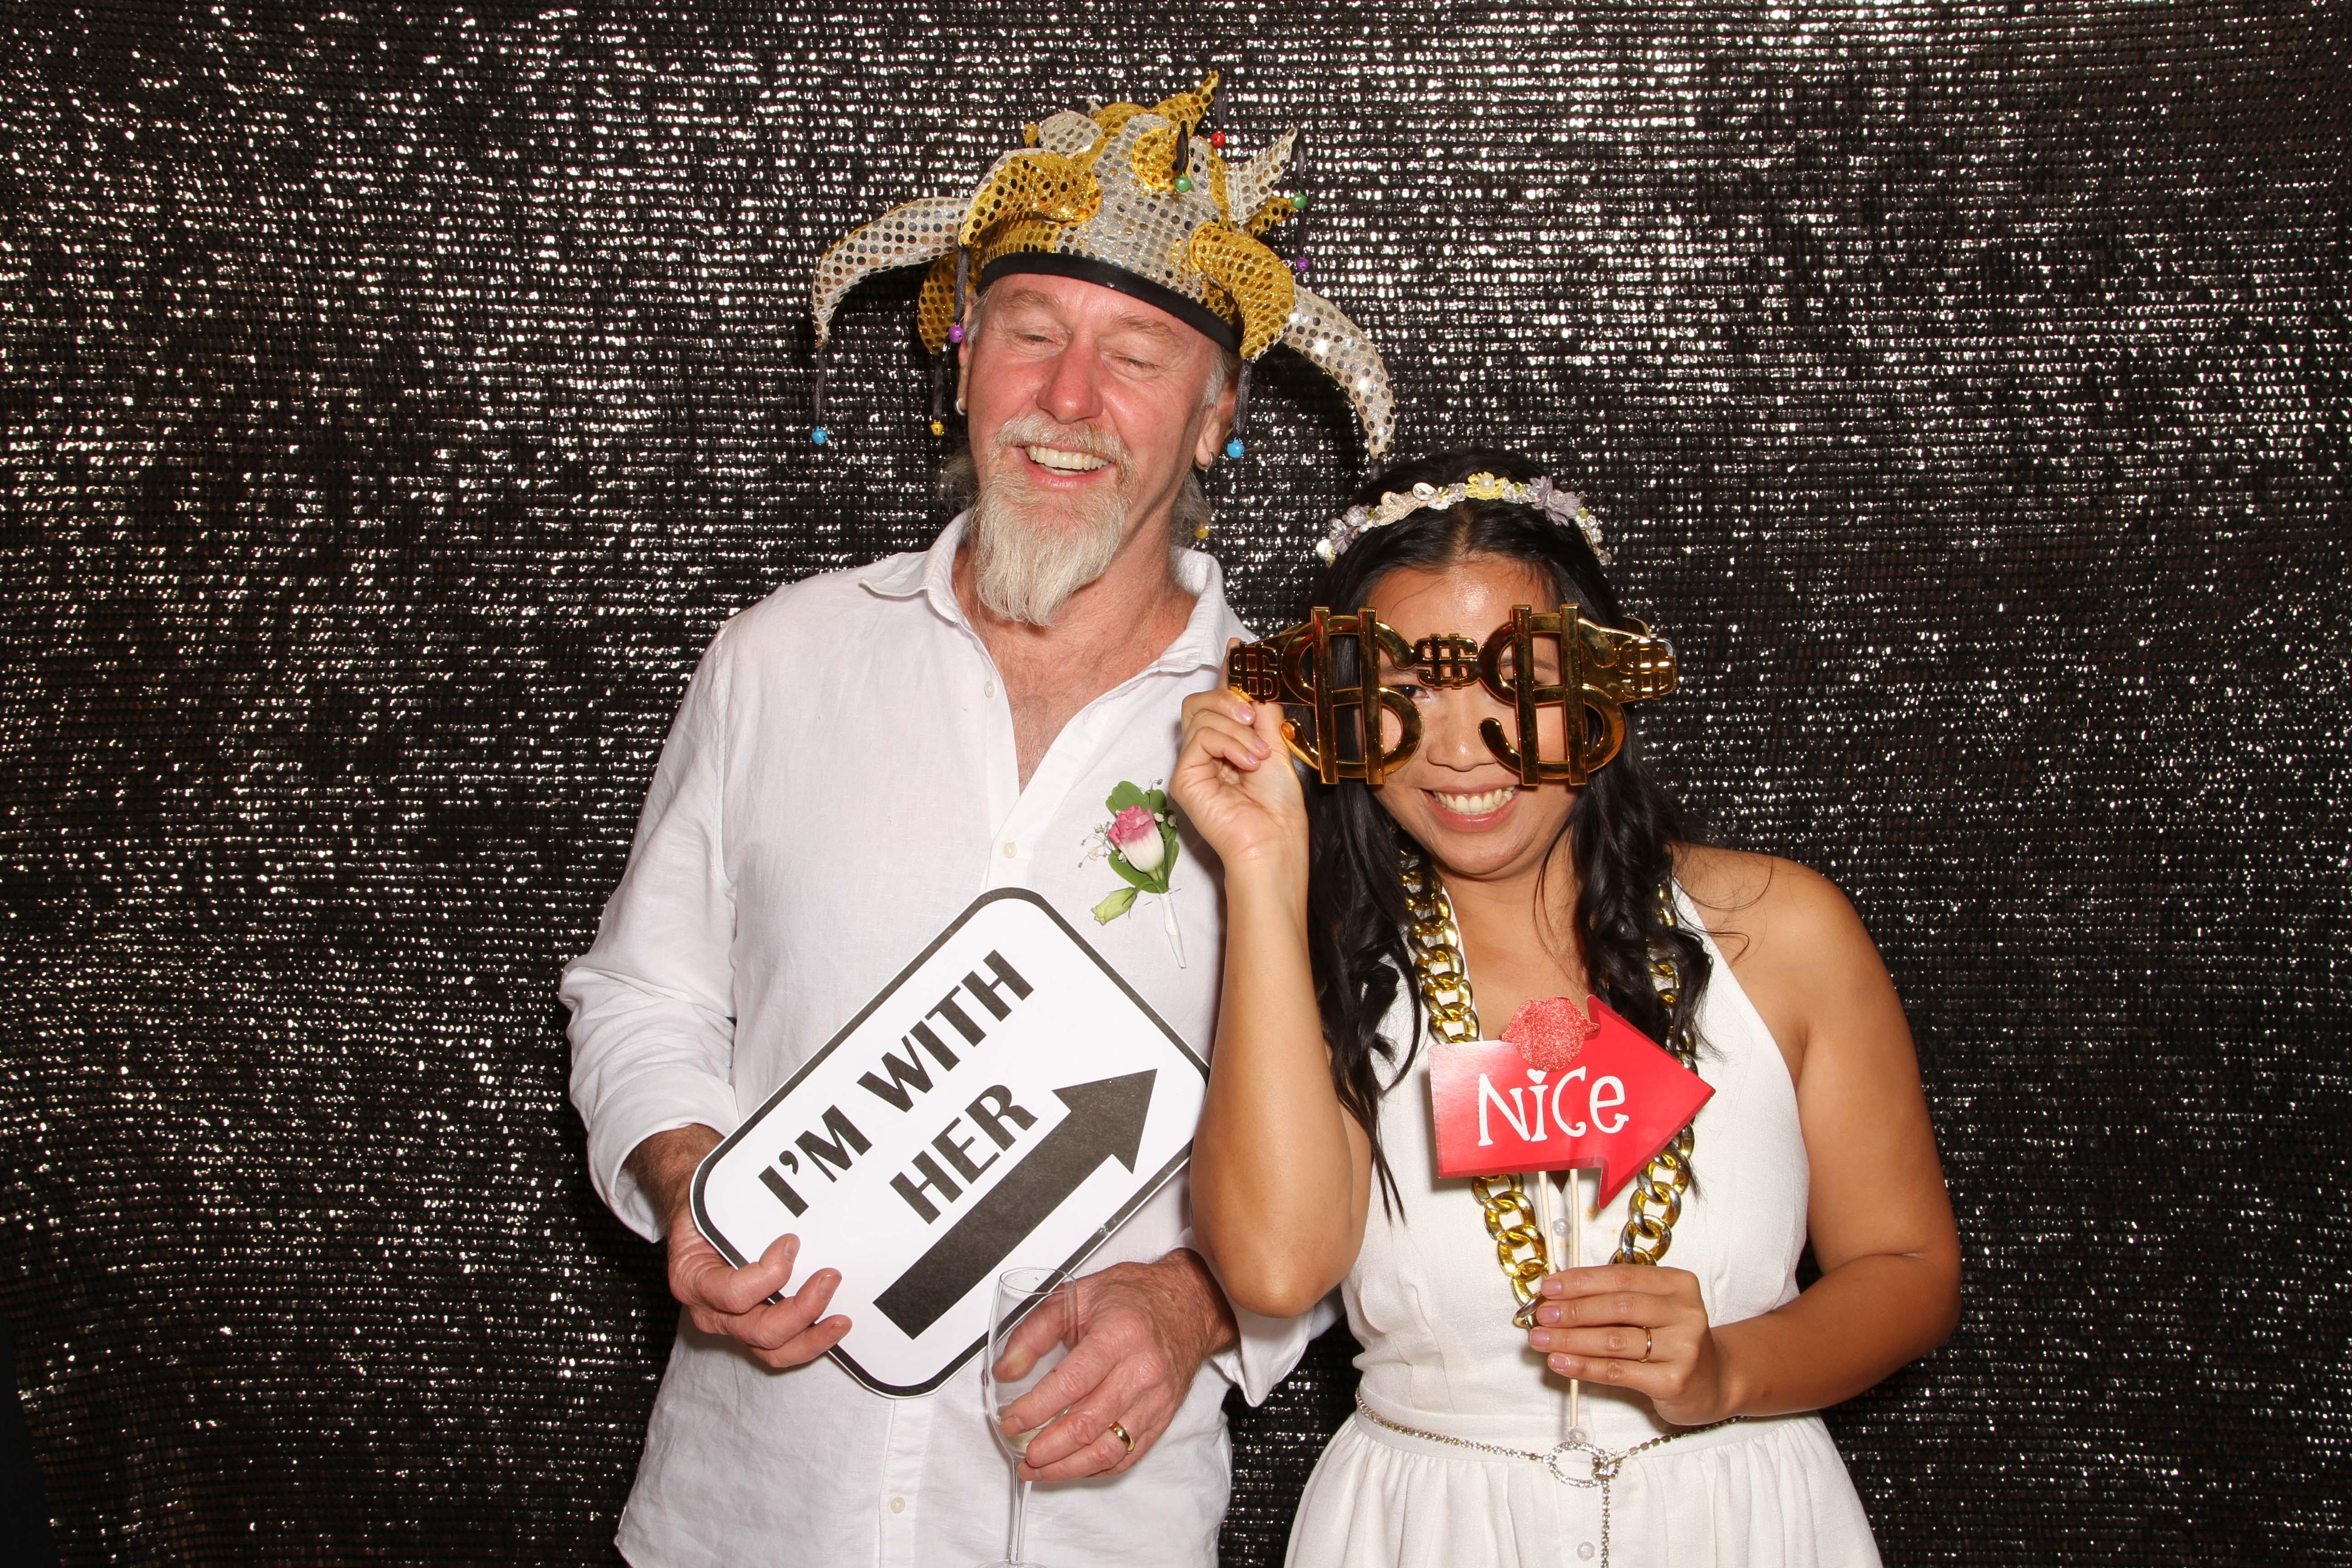 Newman Wedding Photobooth